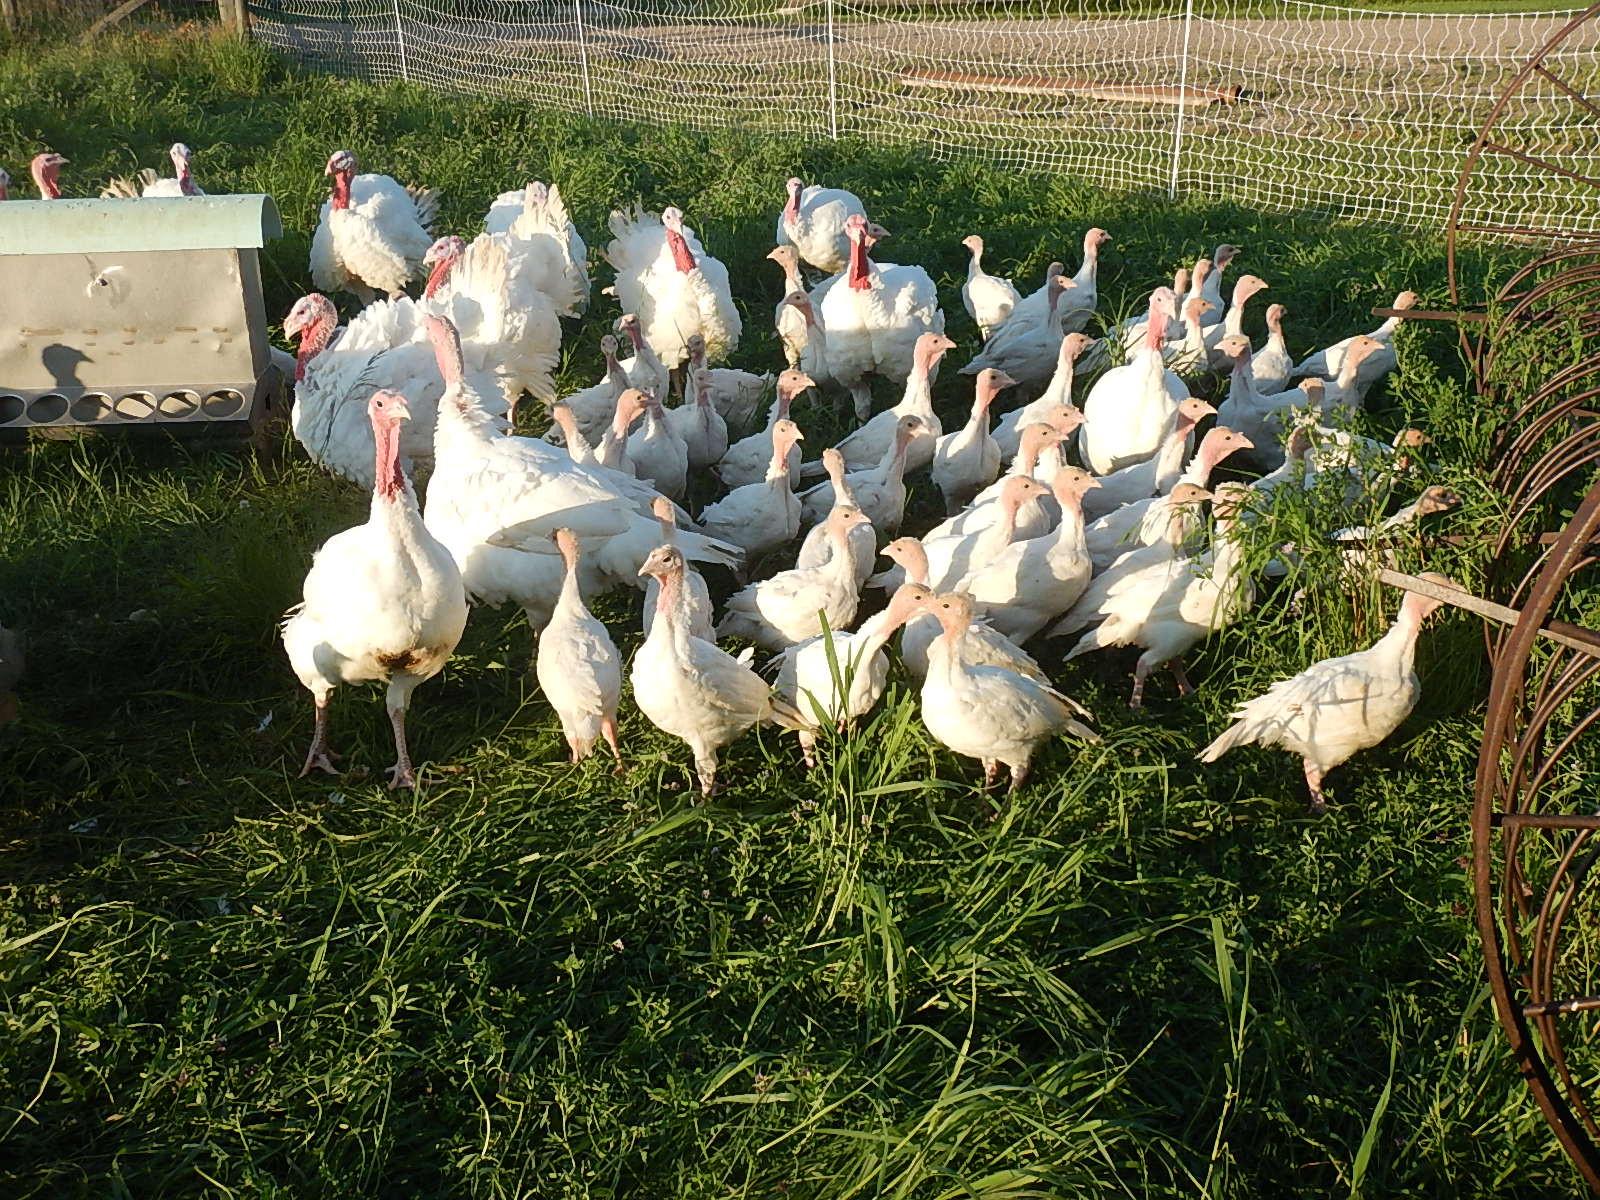 Turkey - Pastured, Whole